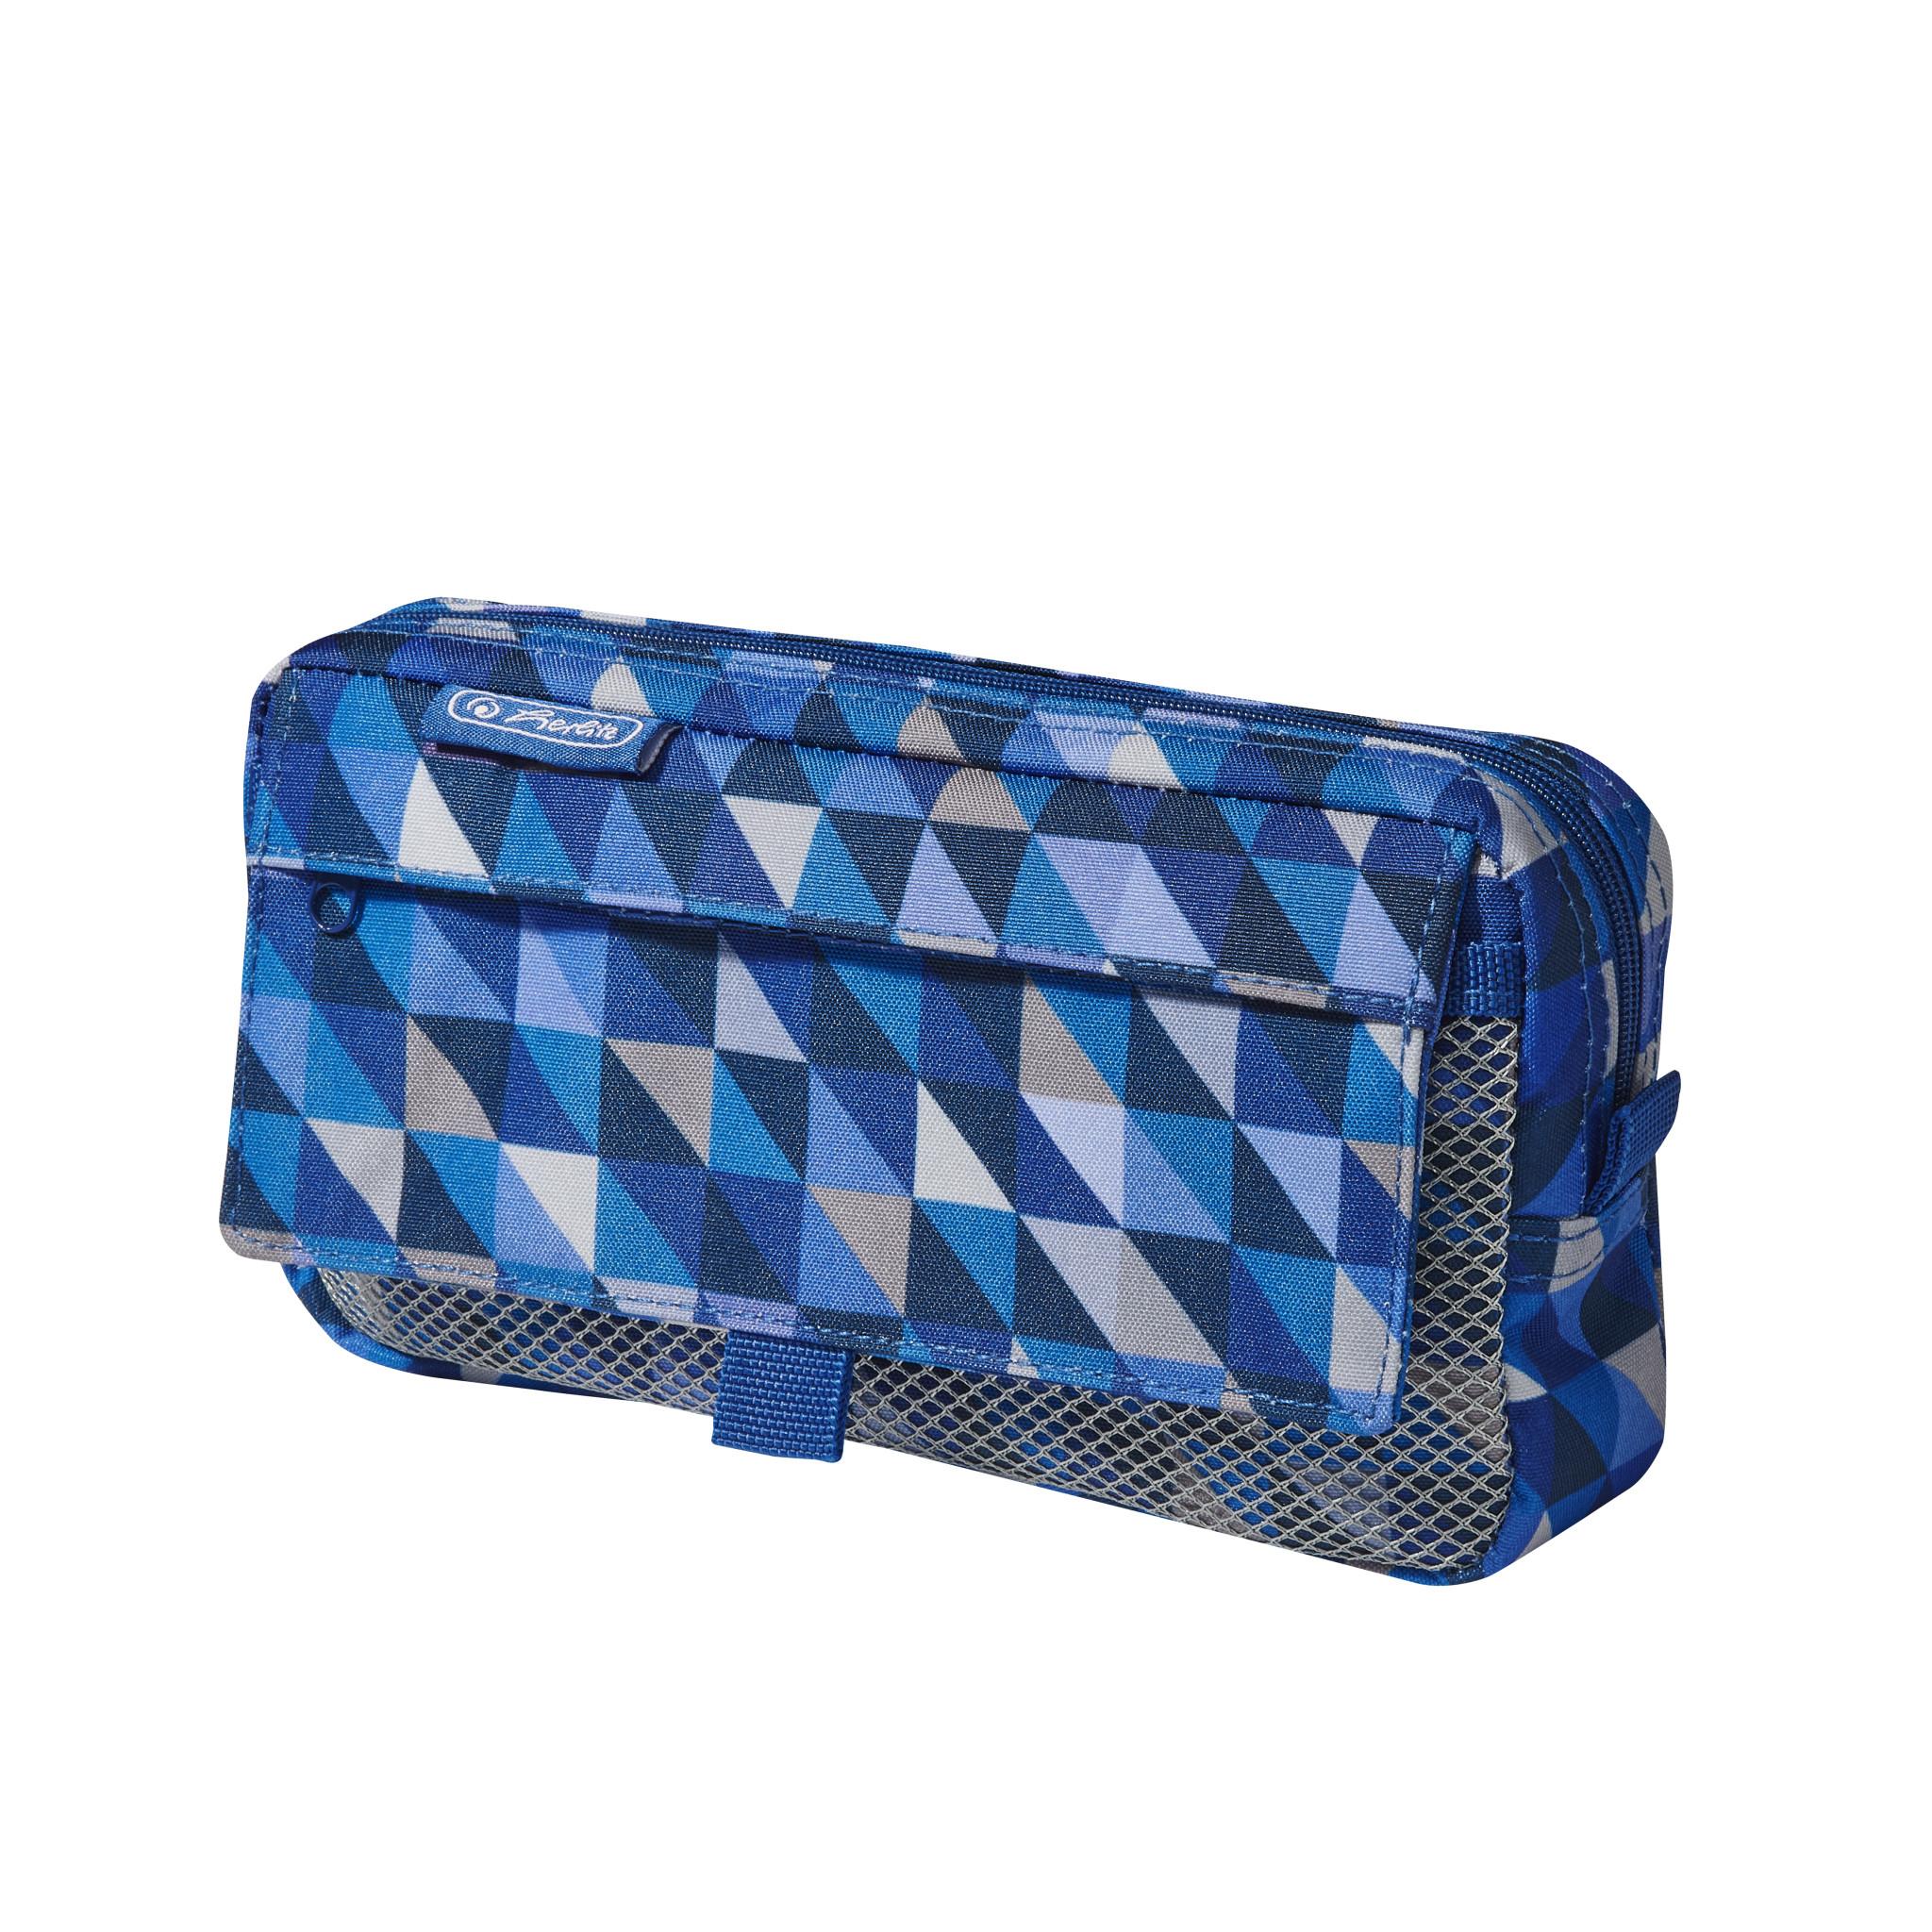 Herlitz 50022052 - Bürokleinmaterial - Blau